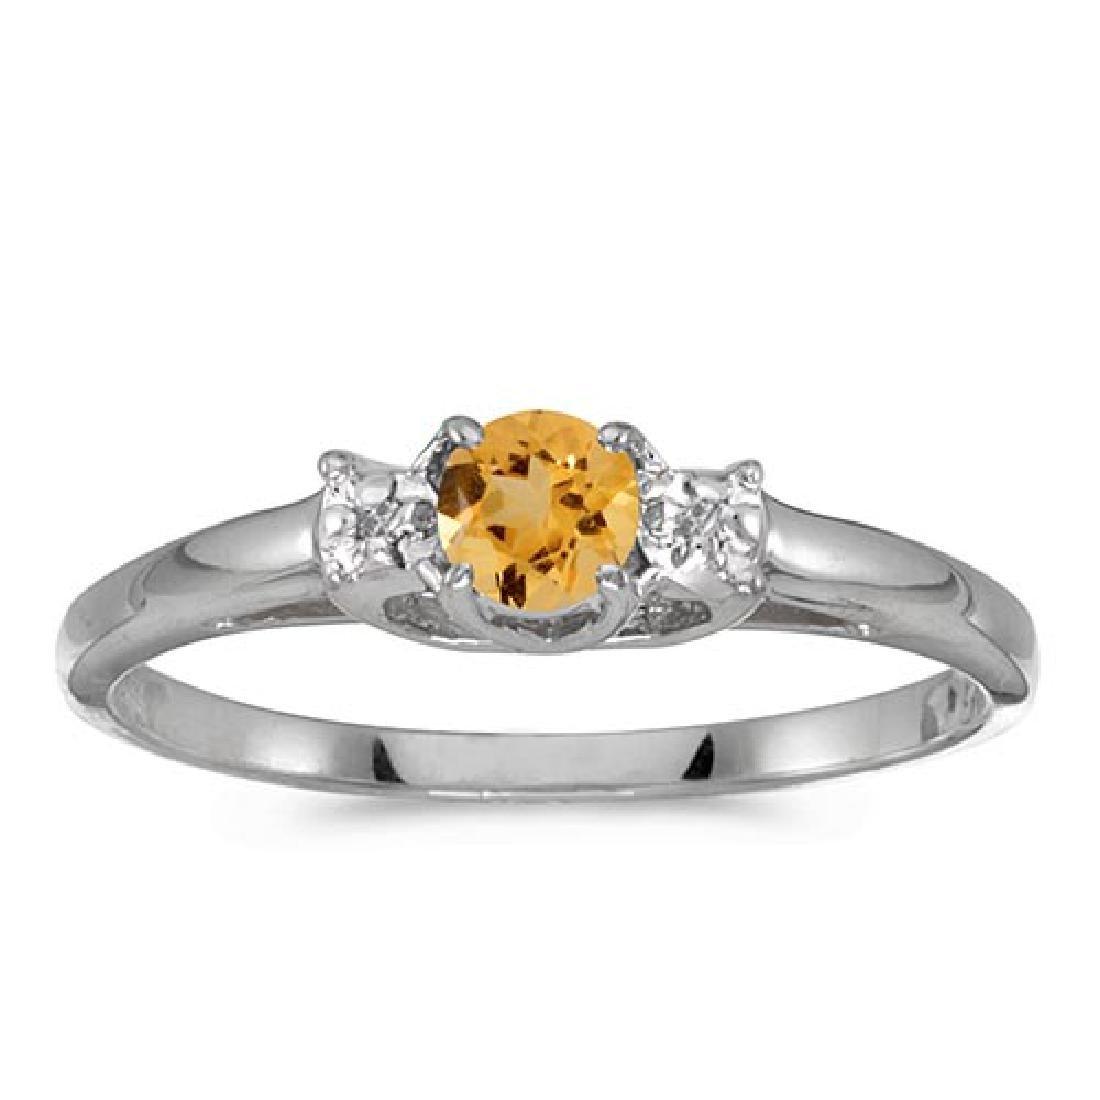 Certified 10k White Gold Round Citrine And Diamond Ring